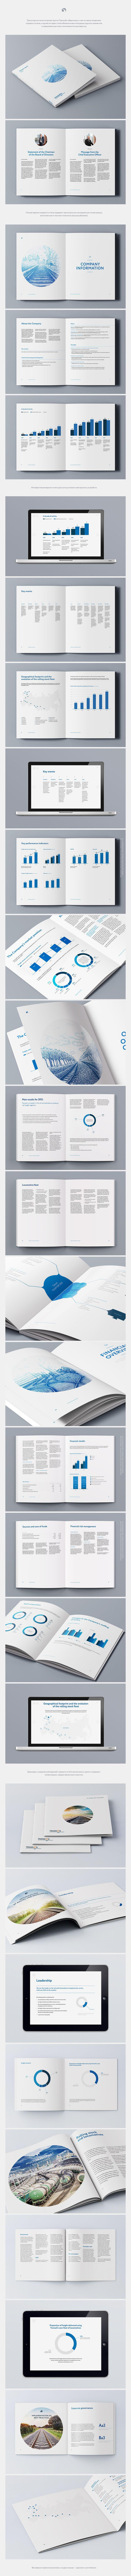 Annual report © Alexander Zhestkov http://revision.ru/work/87370/